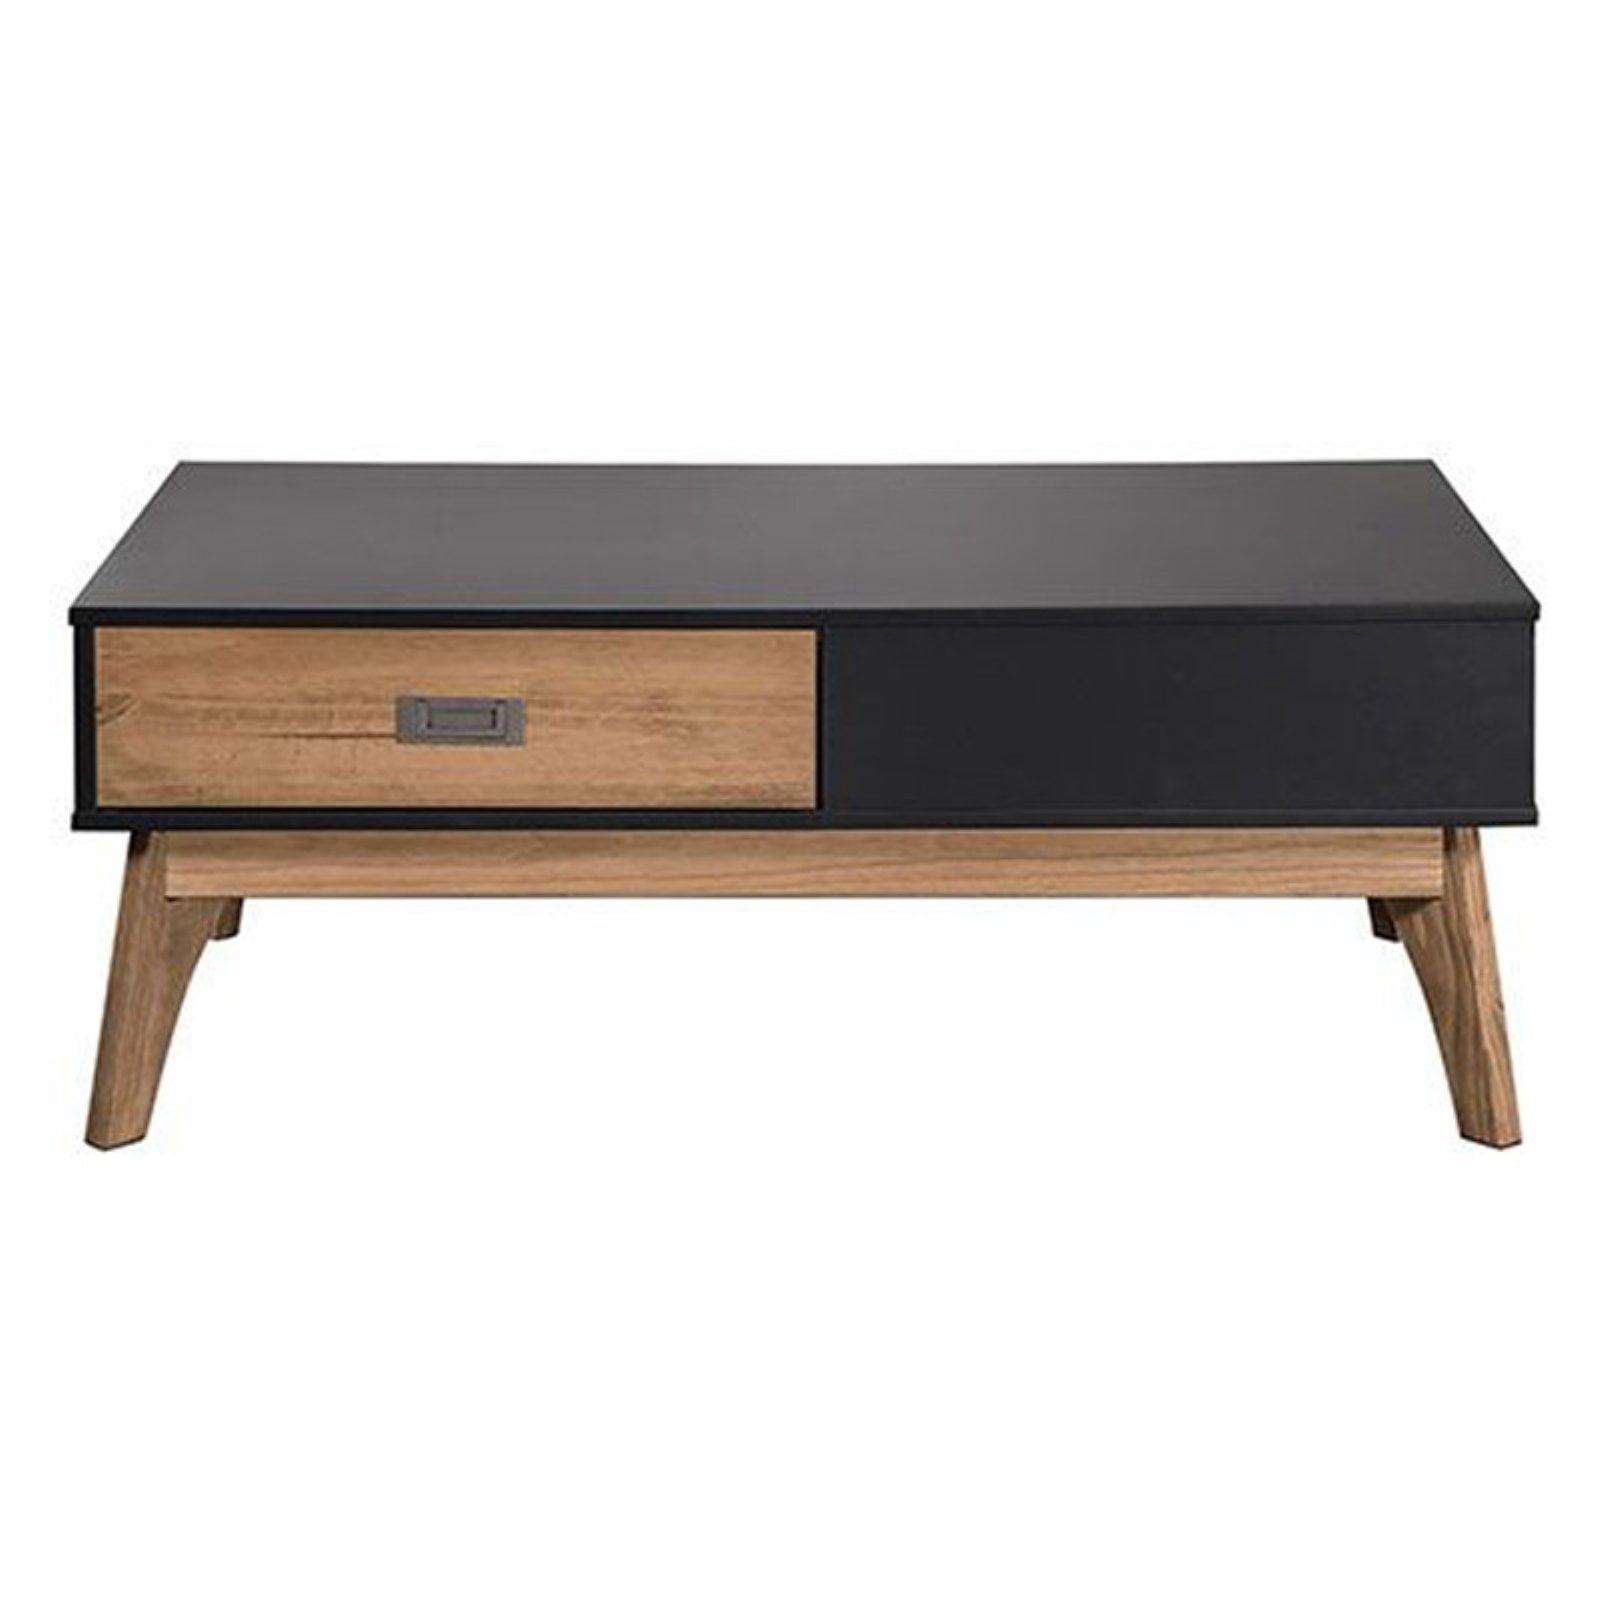 Rustic Mid-Century Modern 2-Drawer Jackie 2.0 Coffee Table